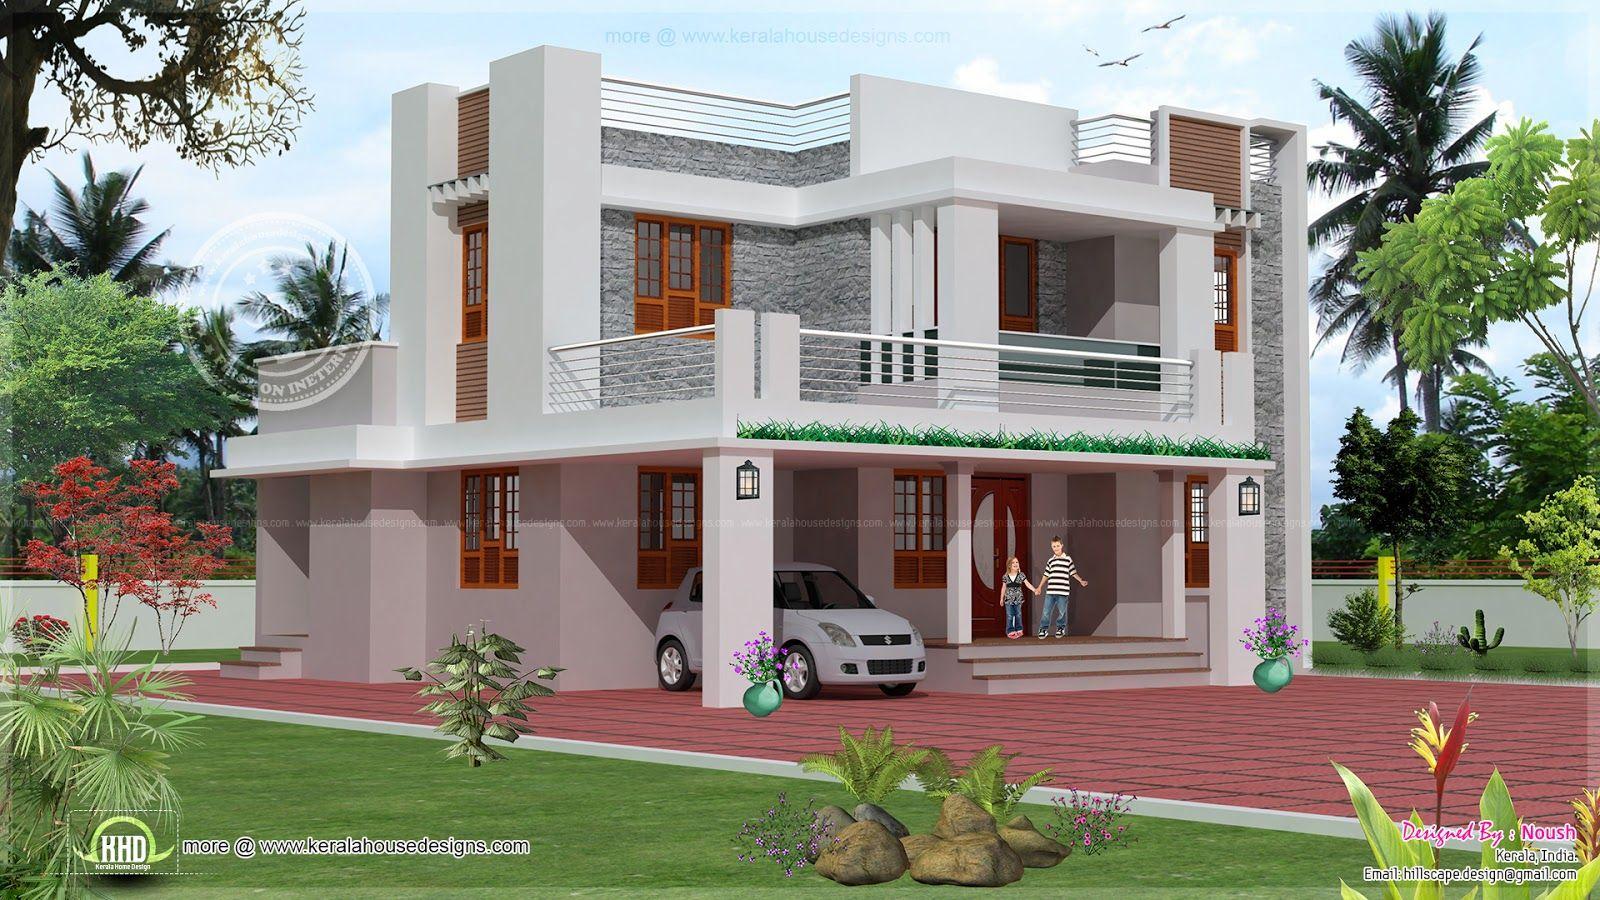 Bedroom 2 Story House Exterior Design Kerala 2 Storey